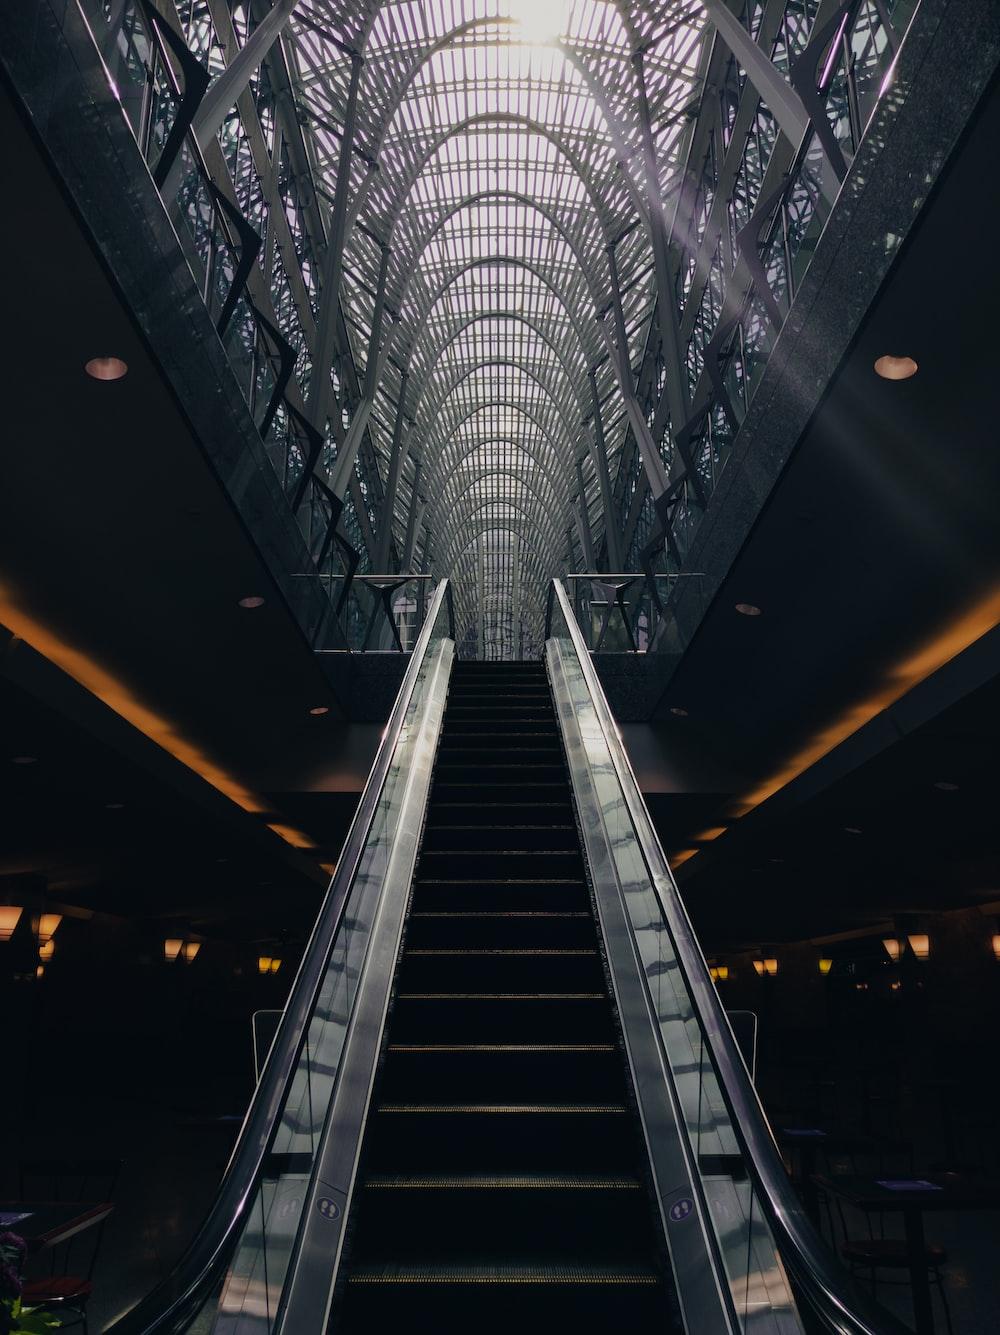 gray and black escalator in a tunnel